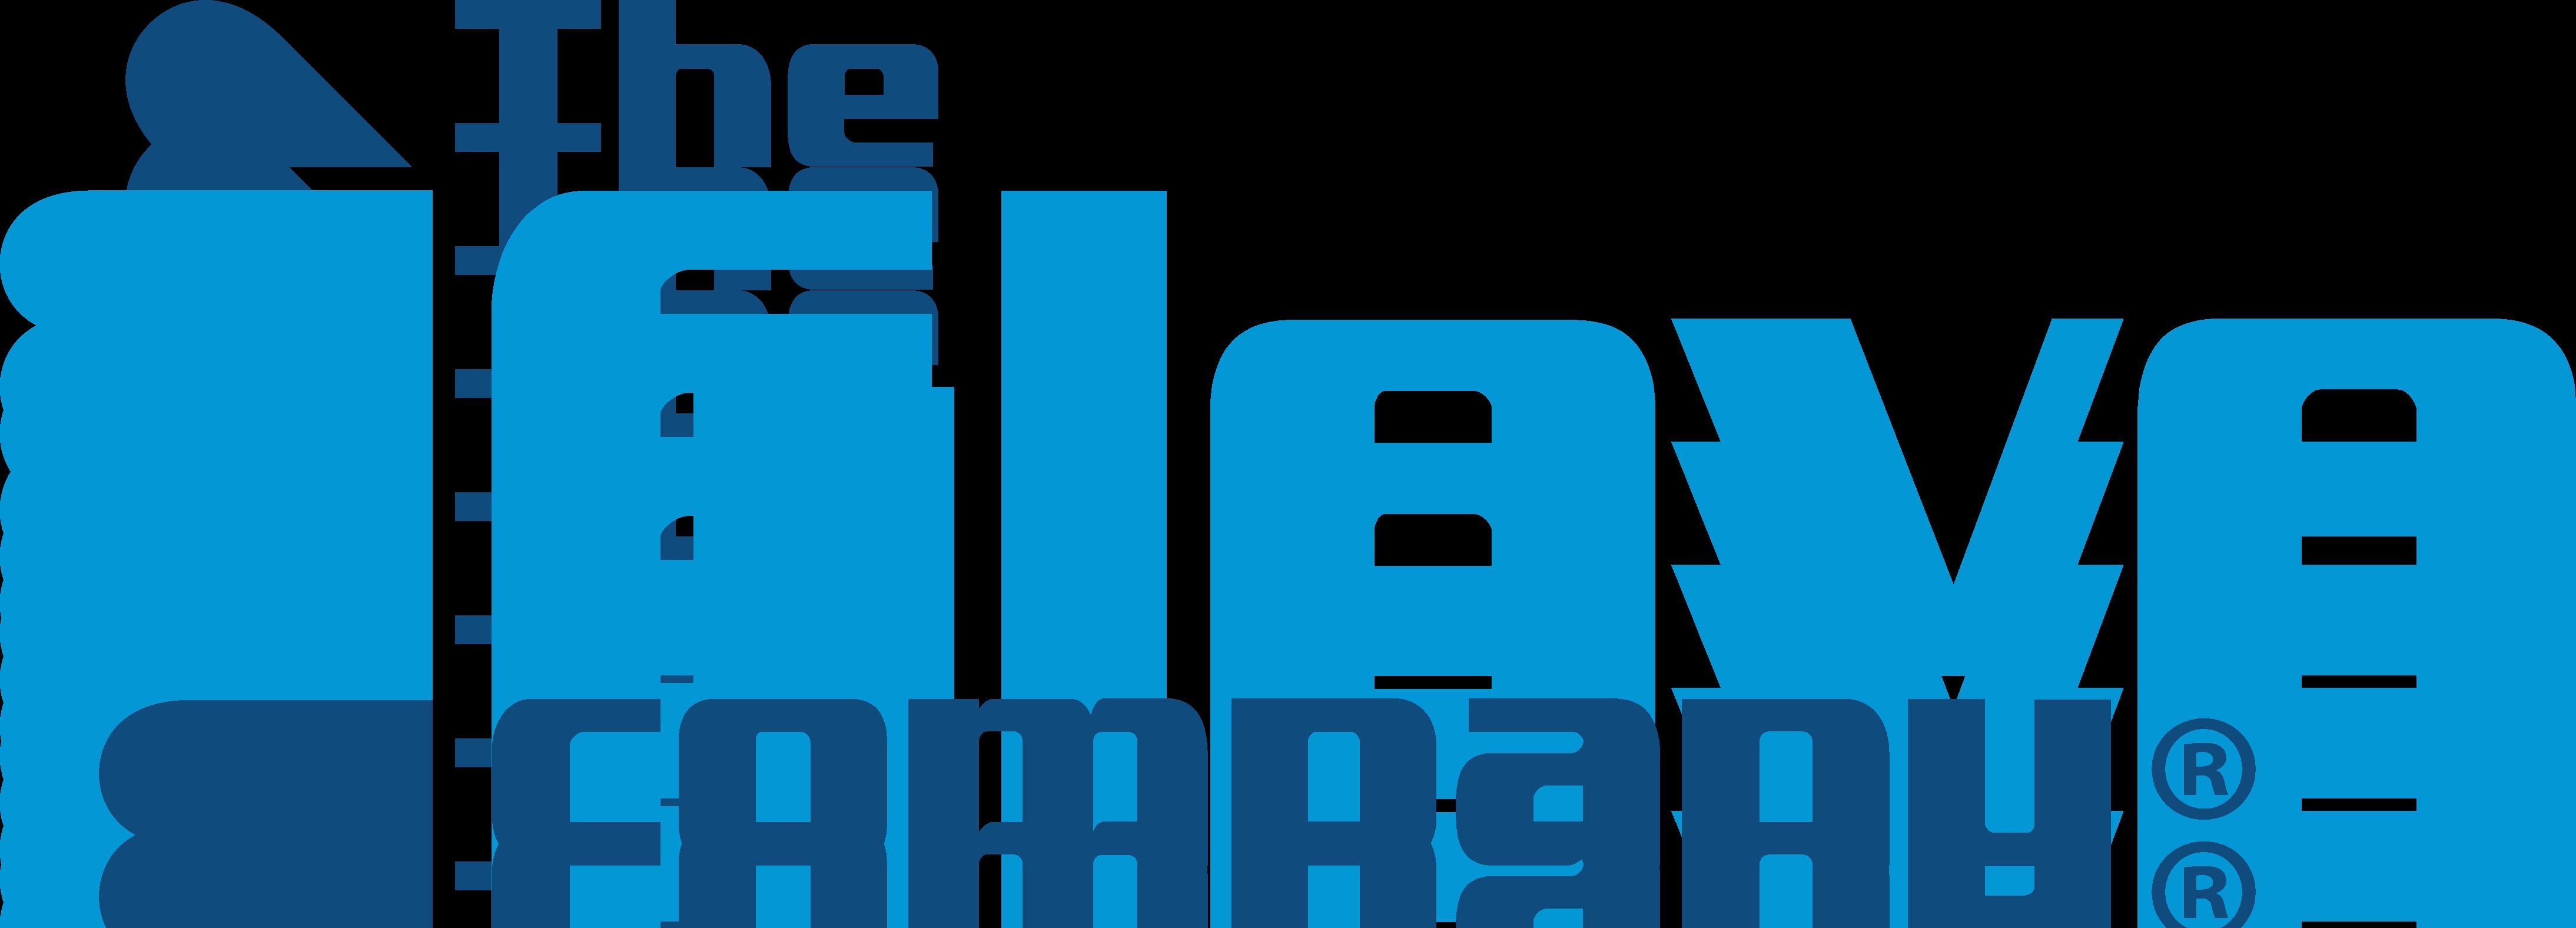 THE GLOVE COMPANY PTY LTD